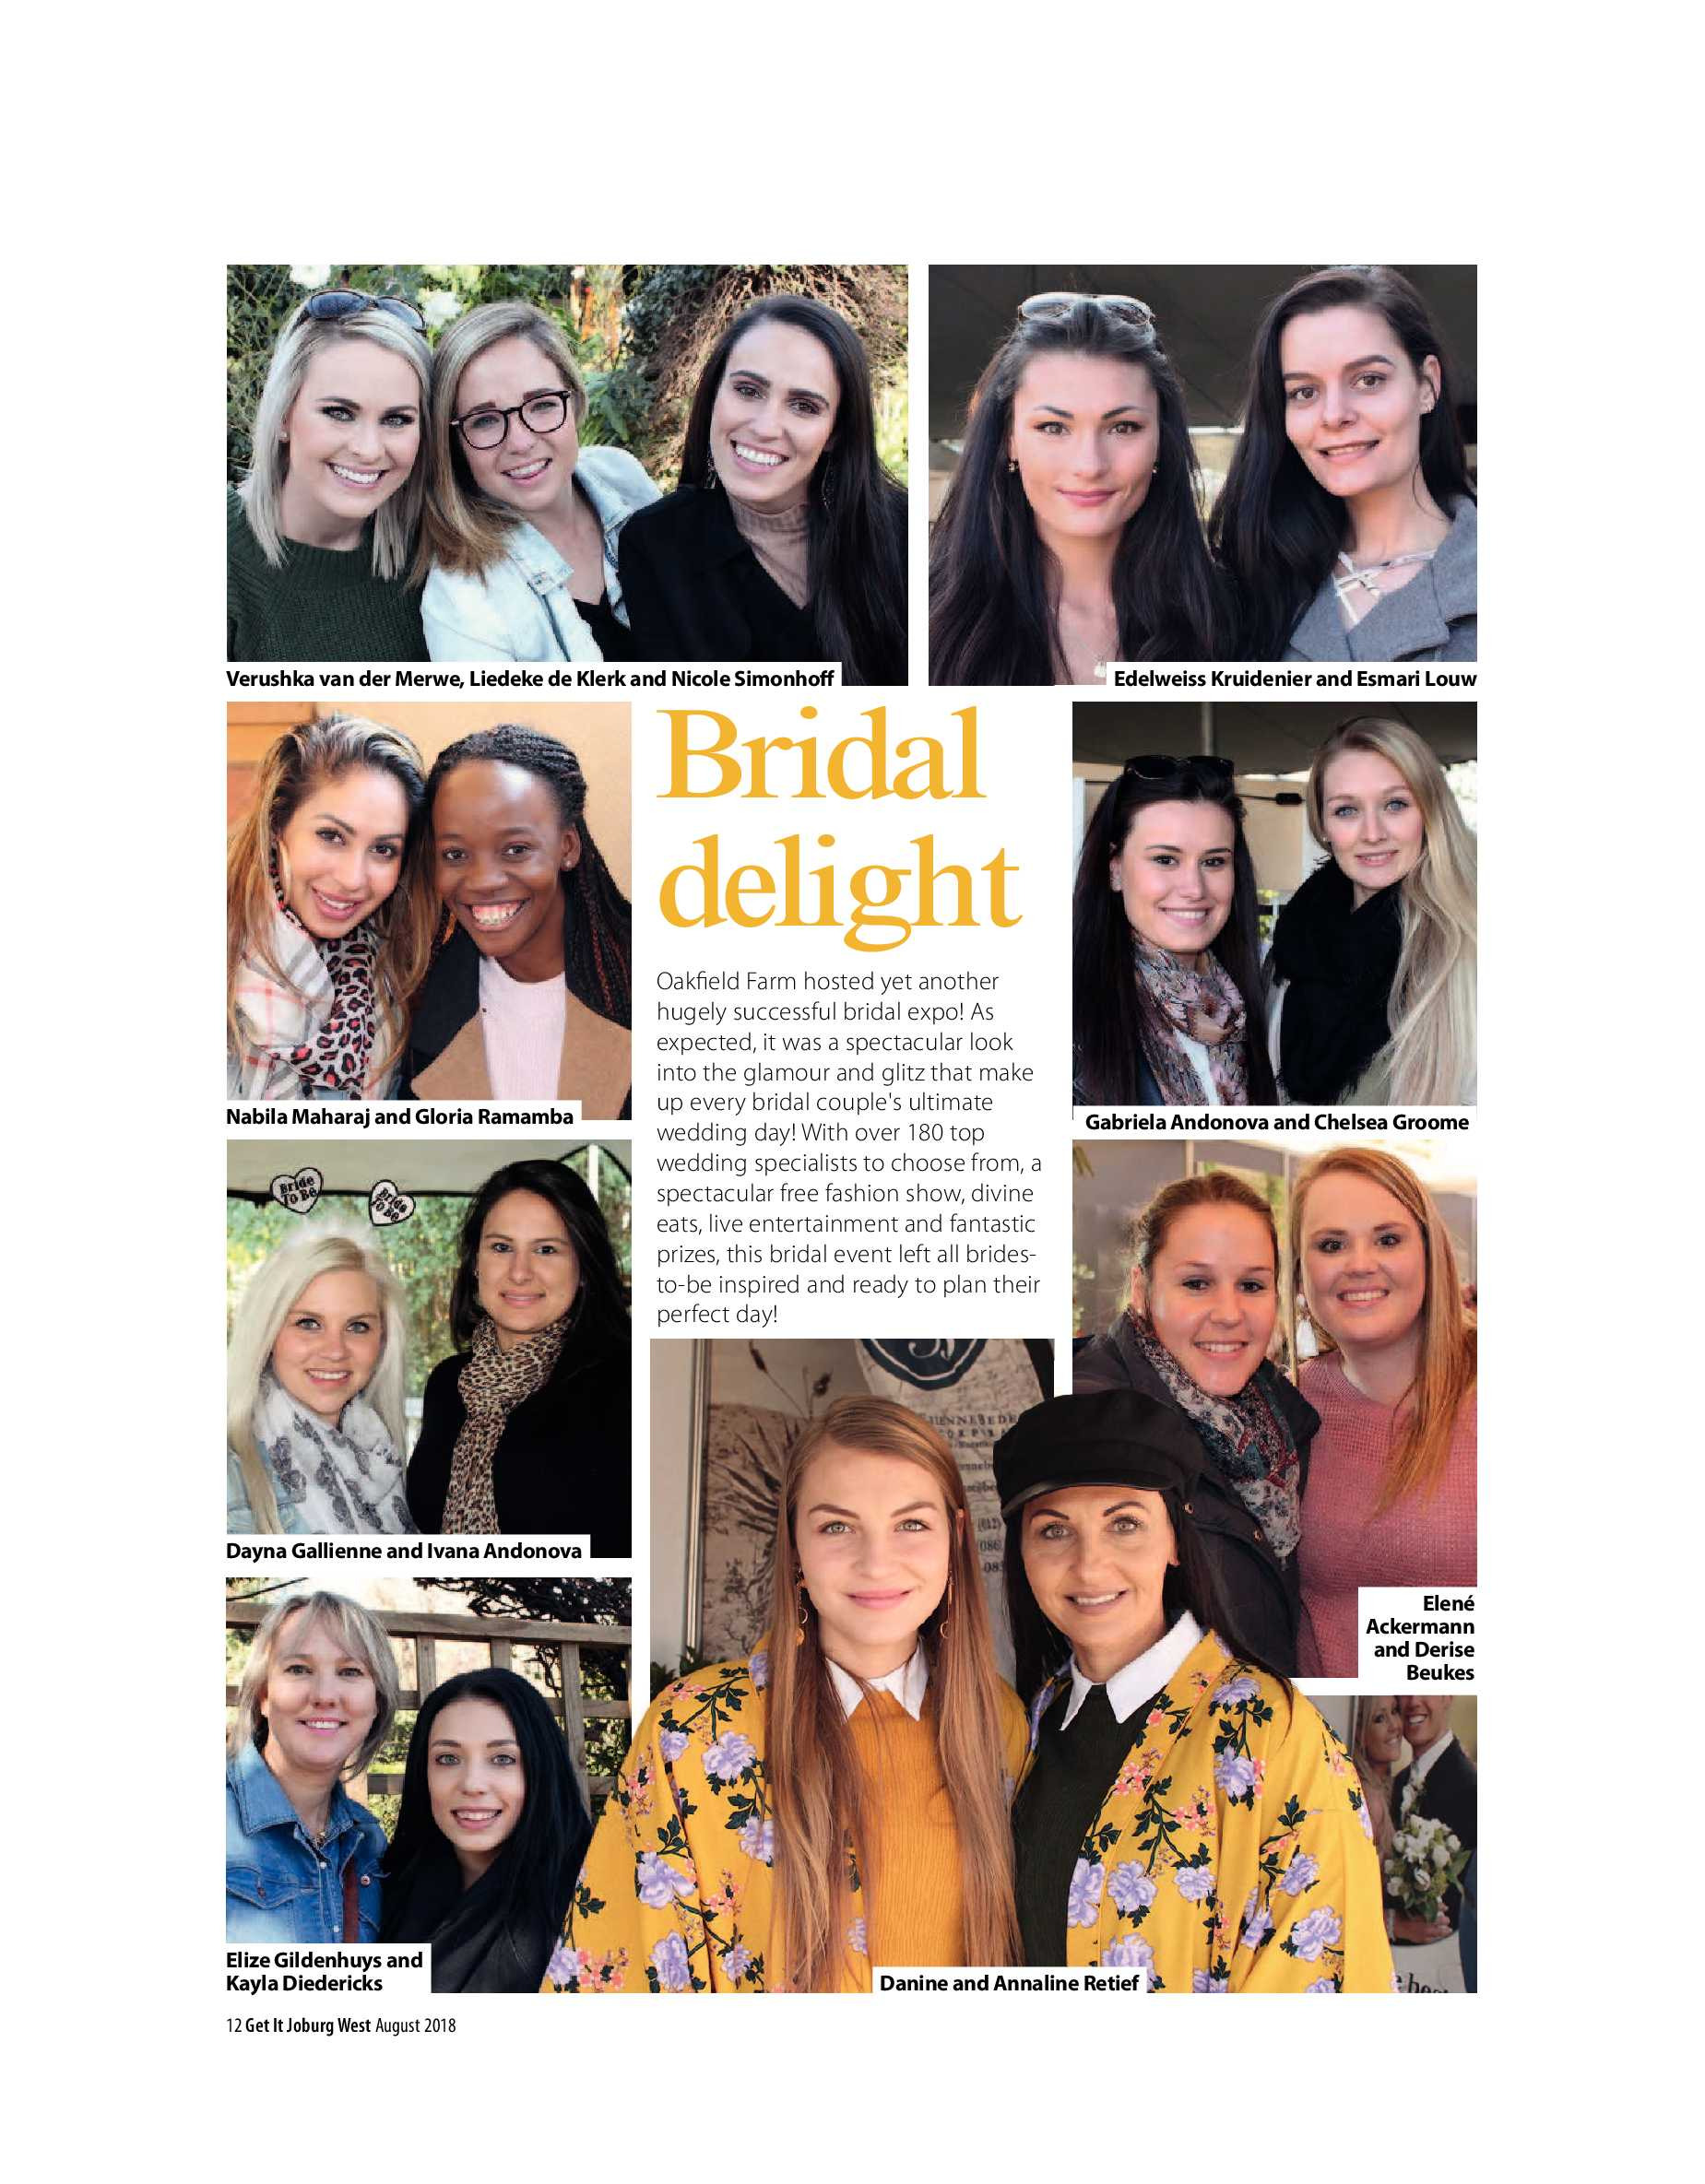 getit-joburg-west-august-2018-epapers-page-12